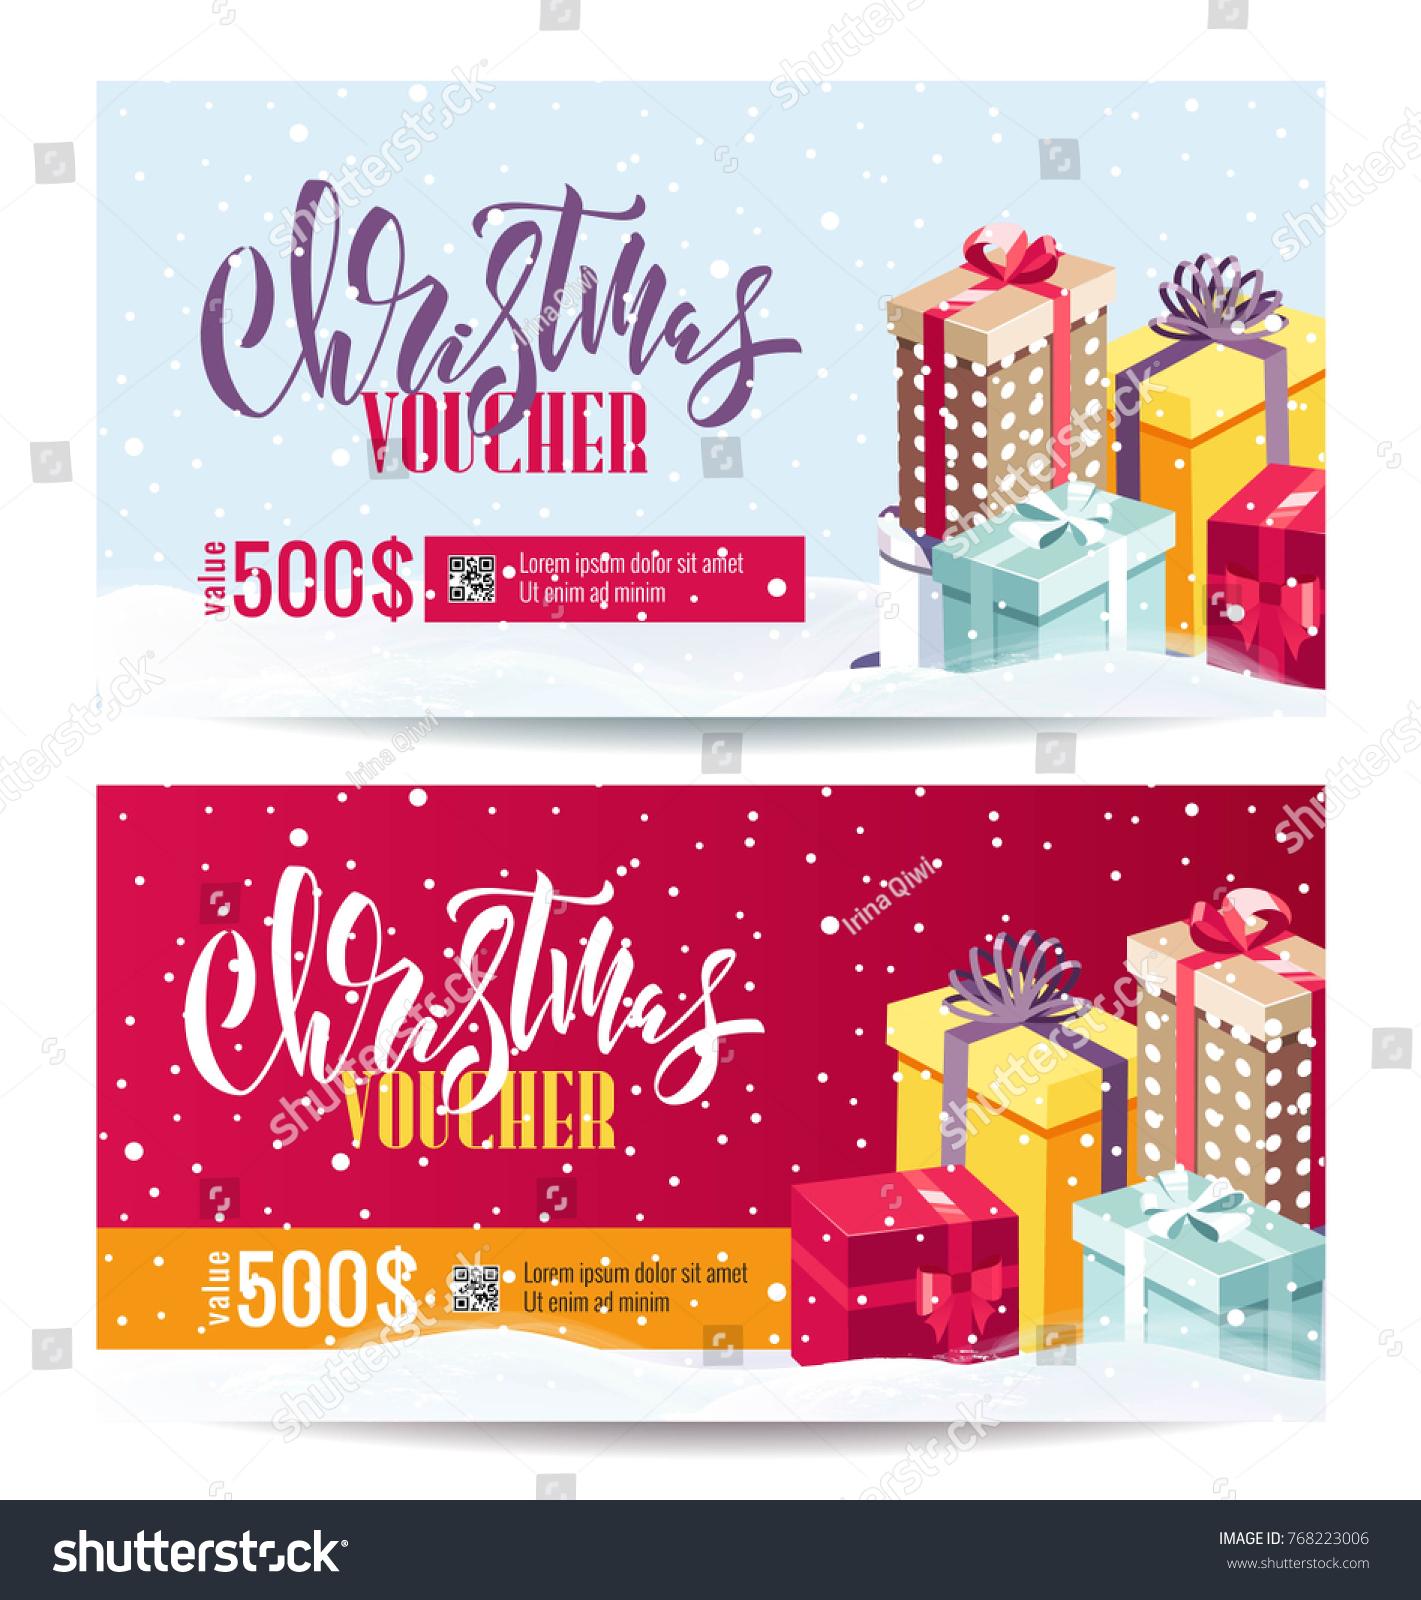 Christmas Gift Voucher Coupon Discount Gift Stock Vector 768223006